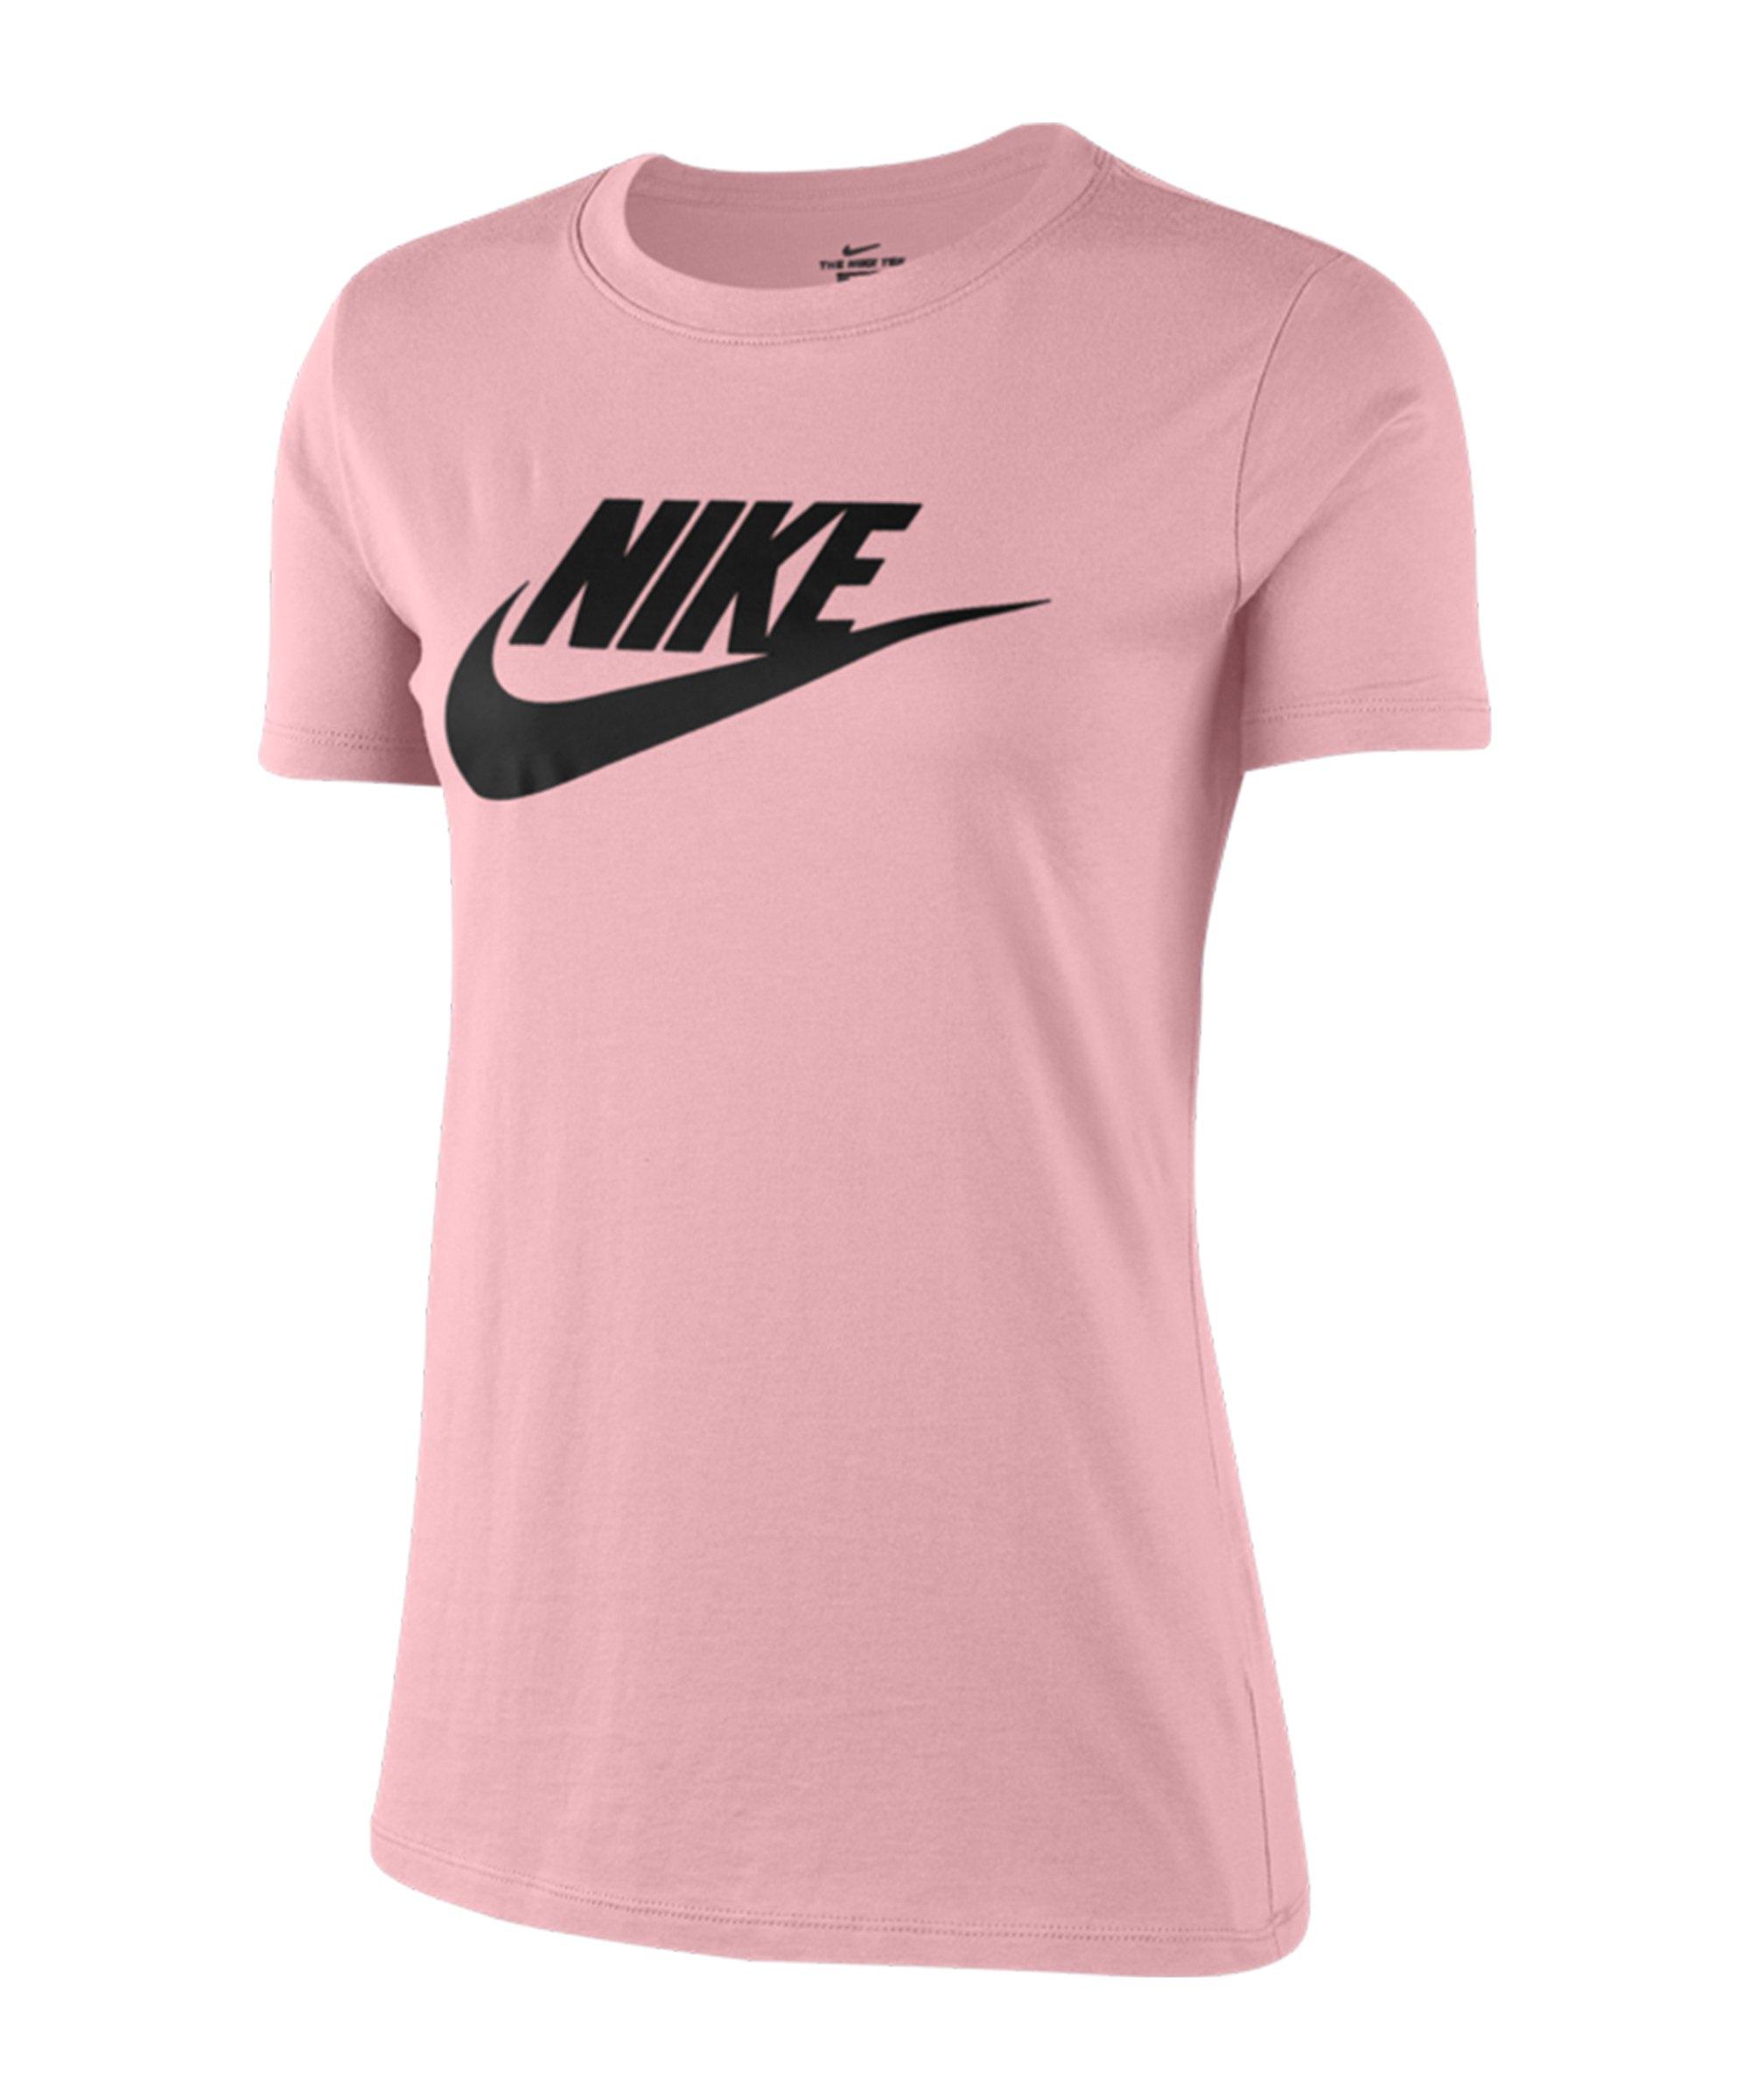 Nike Essential T-Shirt Damen Pink F632 - pink